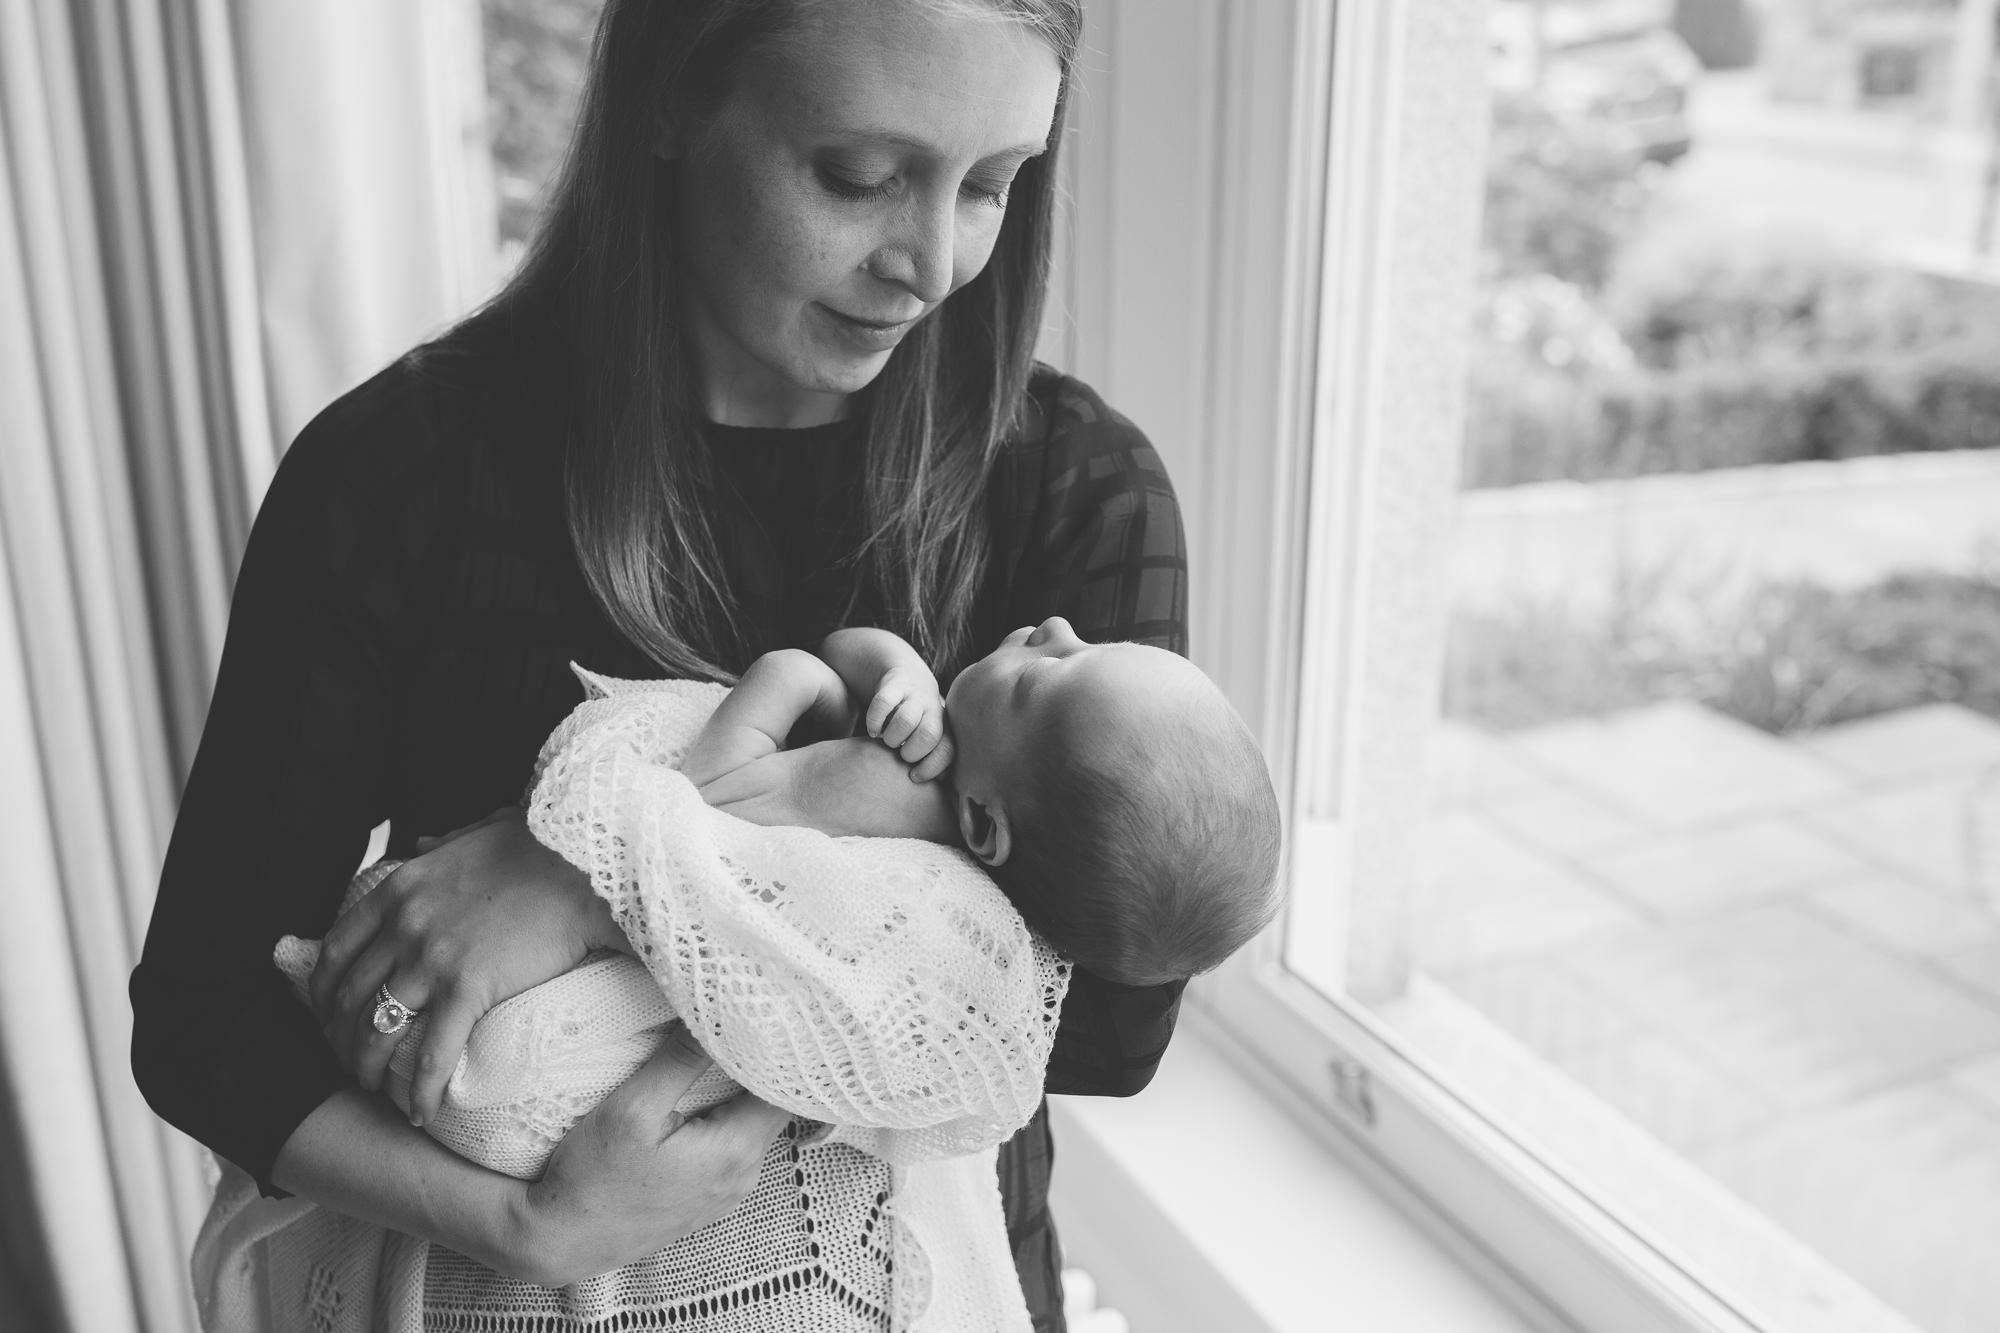 aberdeenshire newborn photography, newborn photographer Aberdeen, baby photos Aberdeen